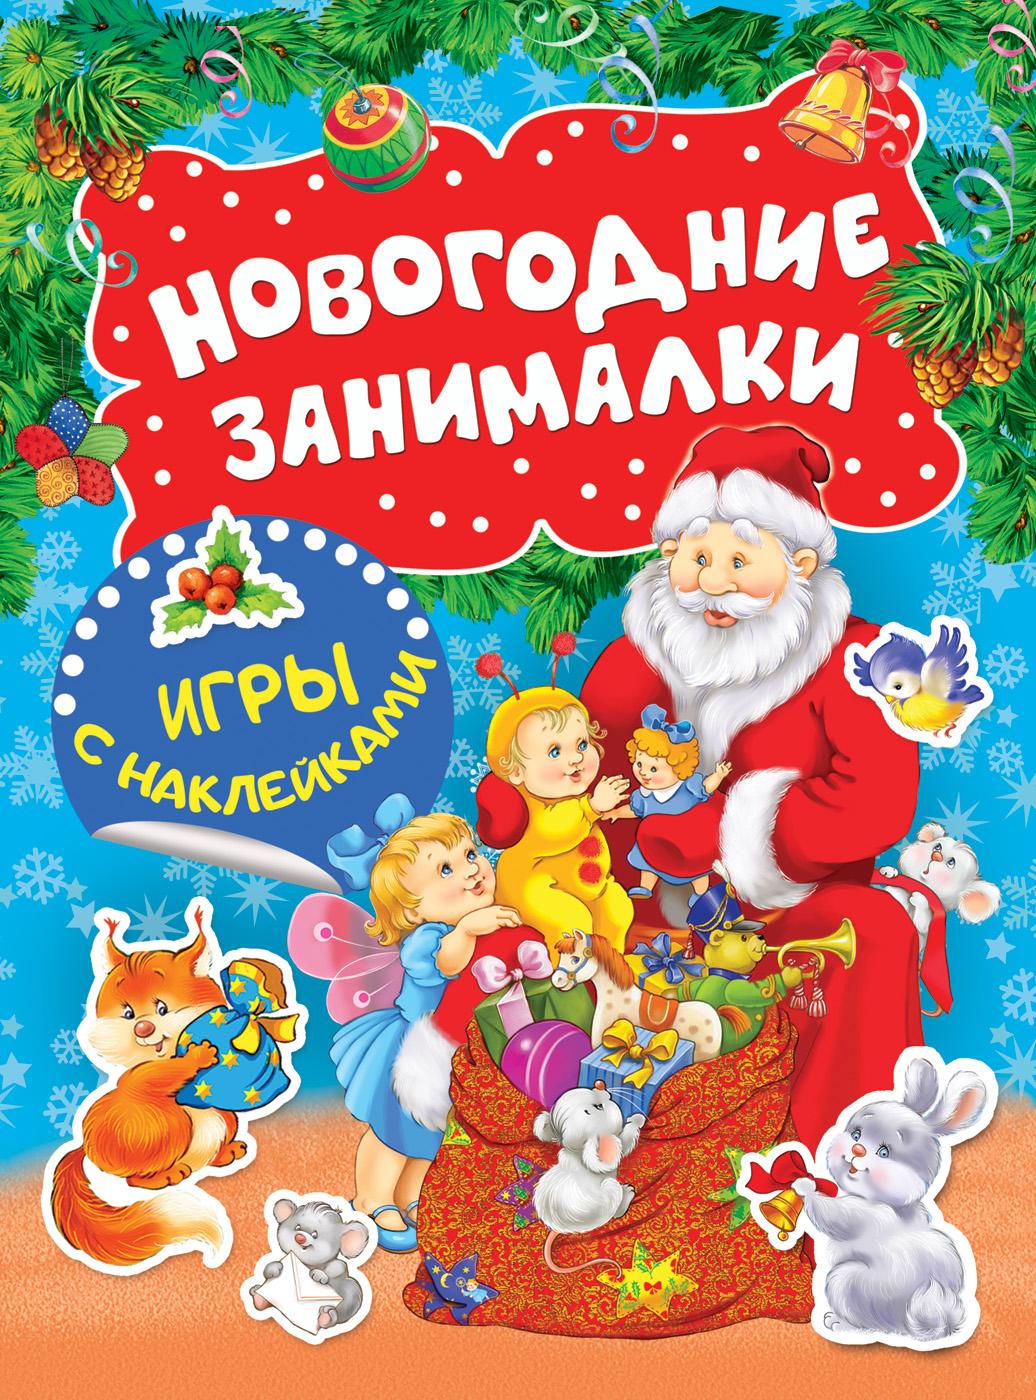 Новикова Е.А. Новогодние занималки. Игры с накл. (Дед Мороз)